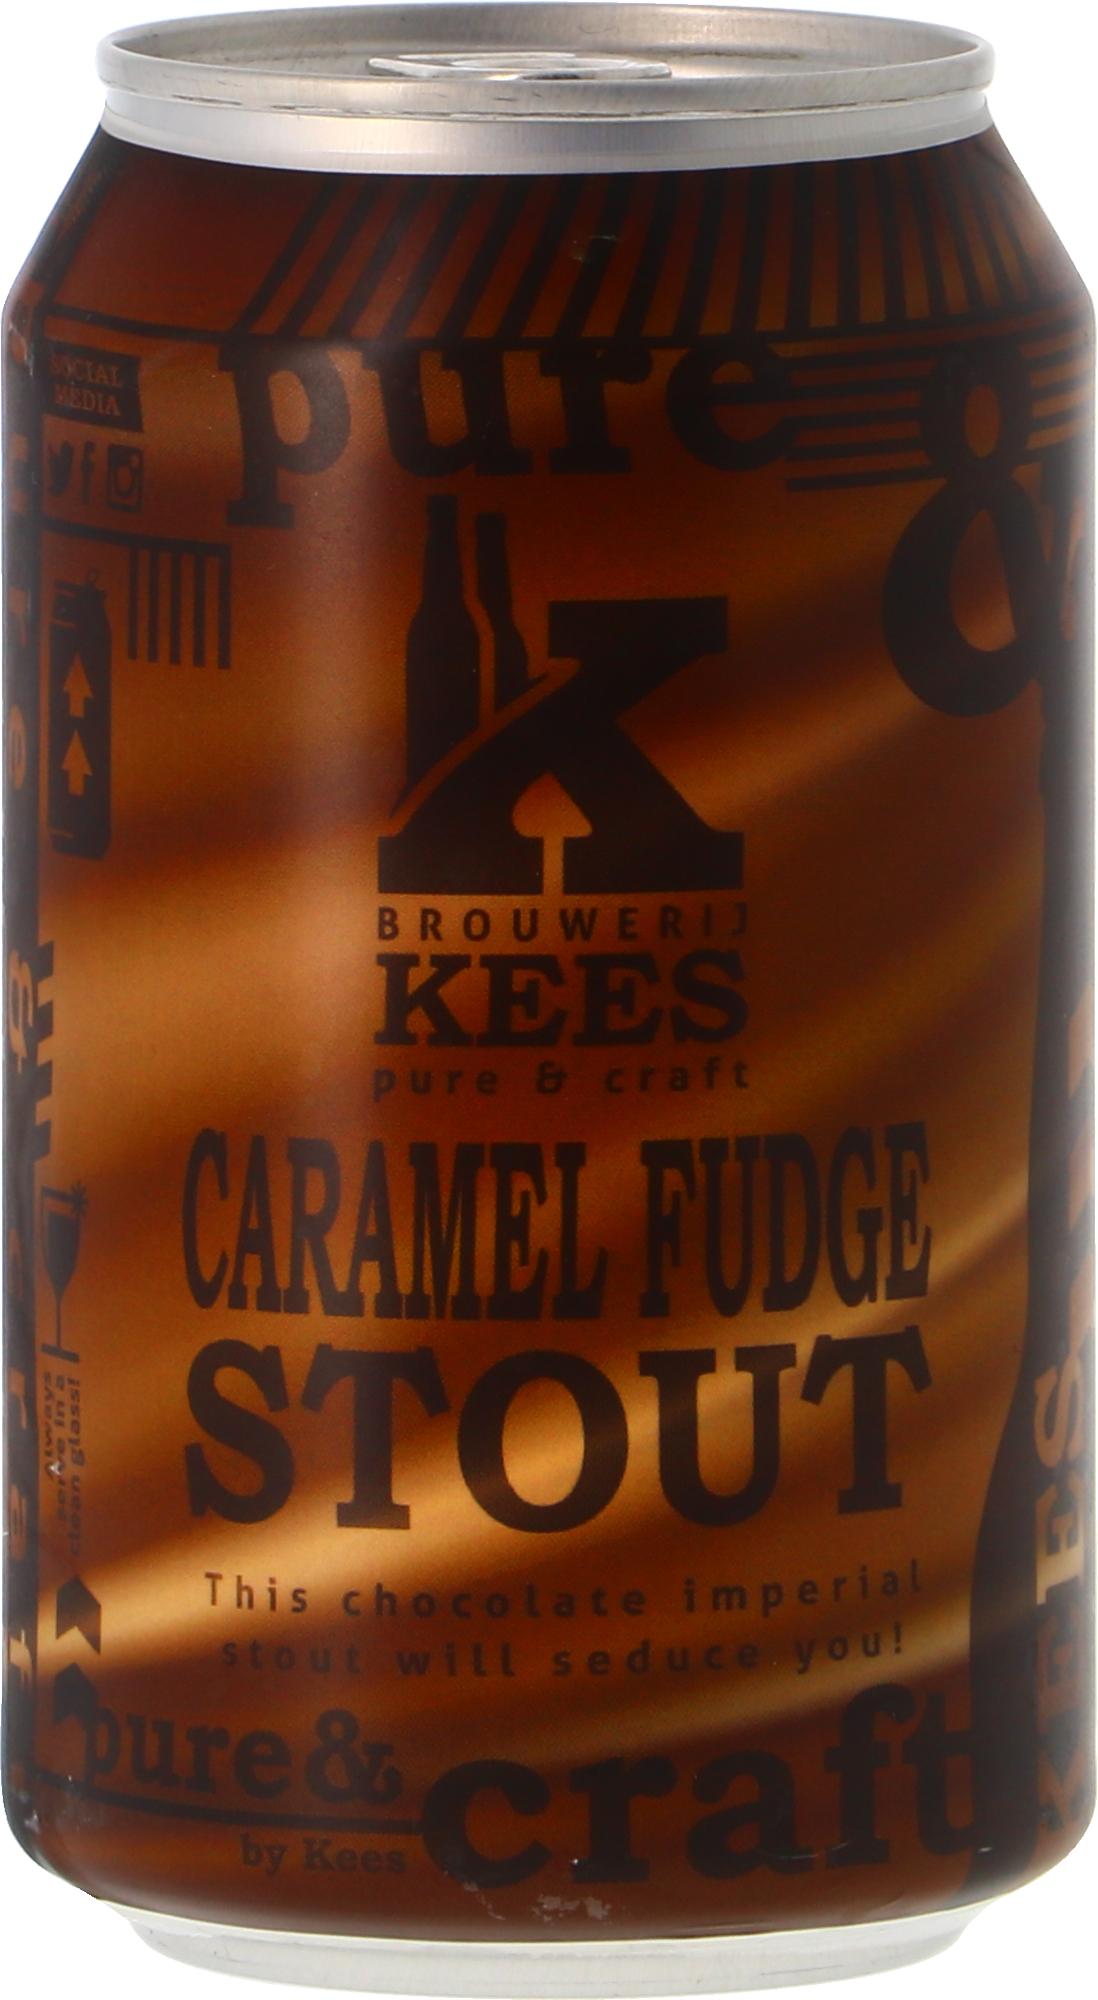 Kees Caramel Fudge Stout - Lata